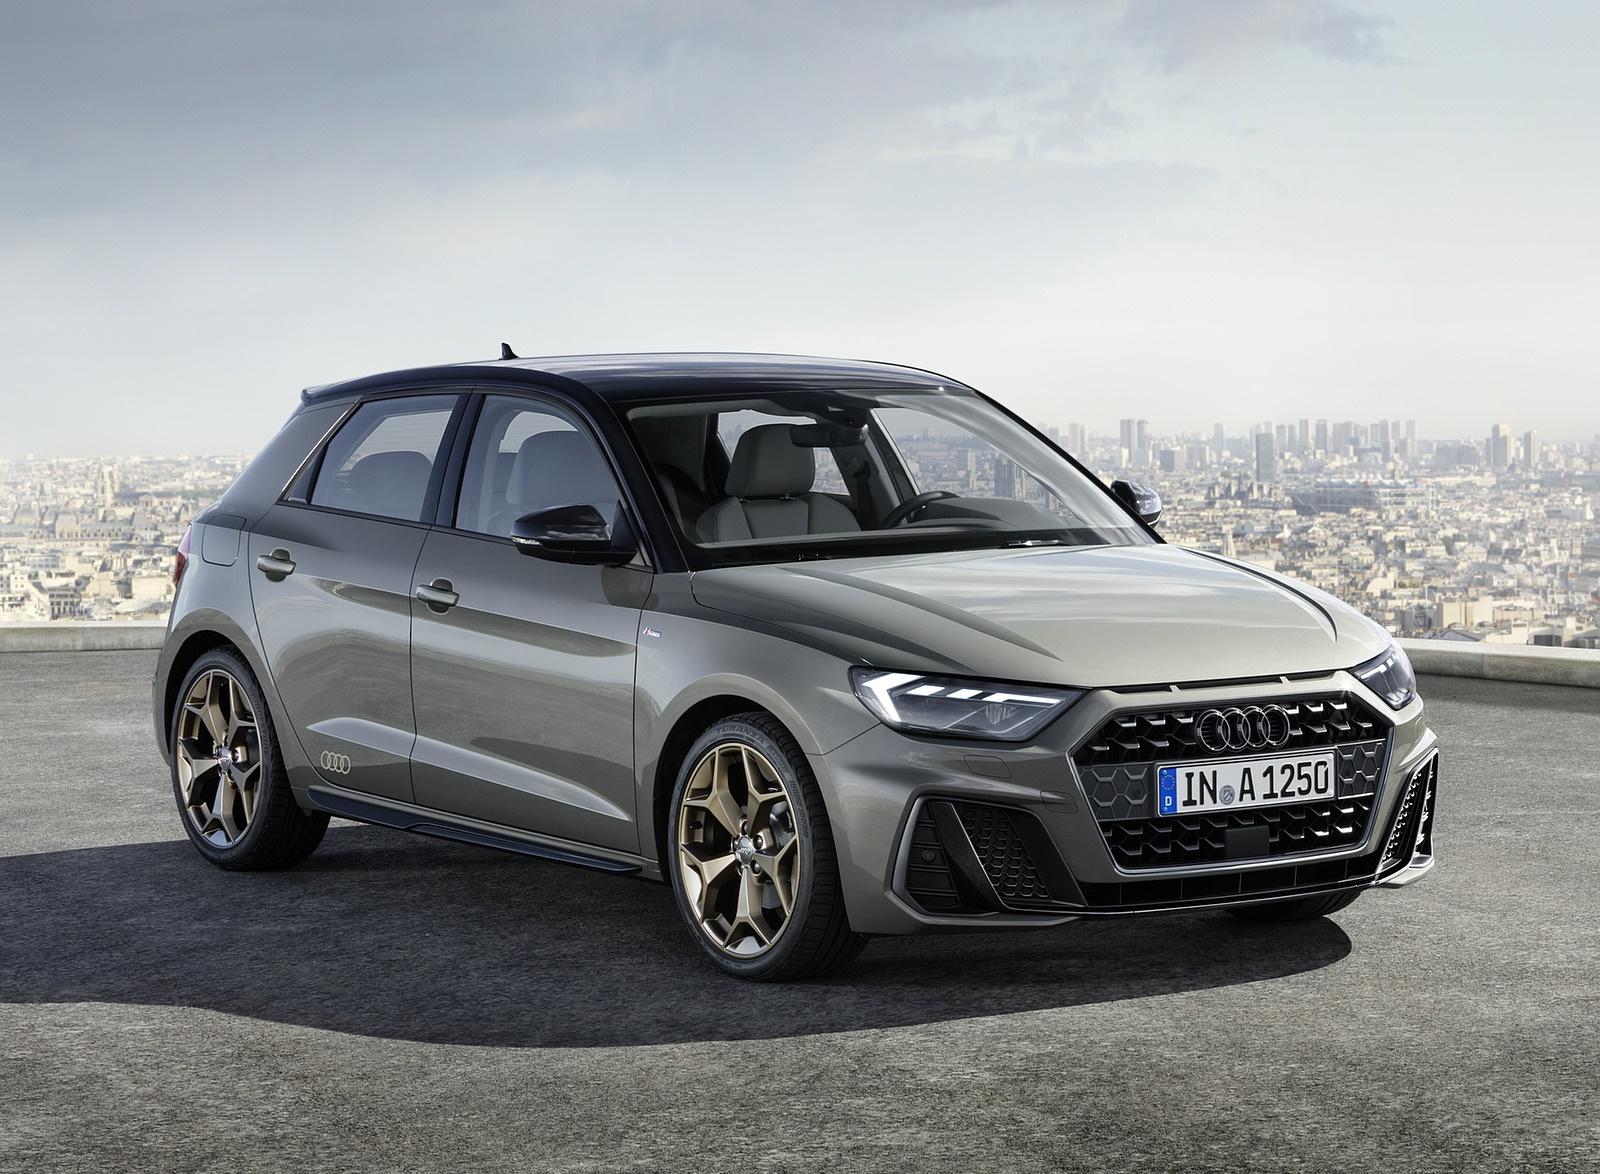 2019 Audi A1 Sportback (Color: Chronos Grey) Front Three-Quarter Wallpapers (1)